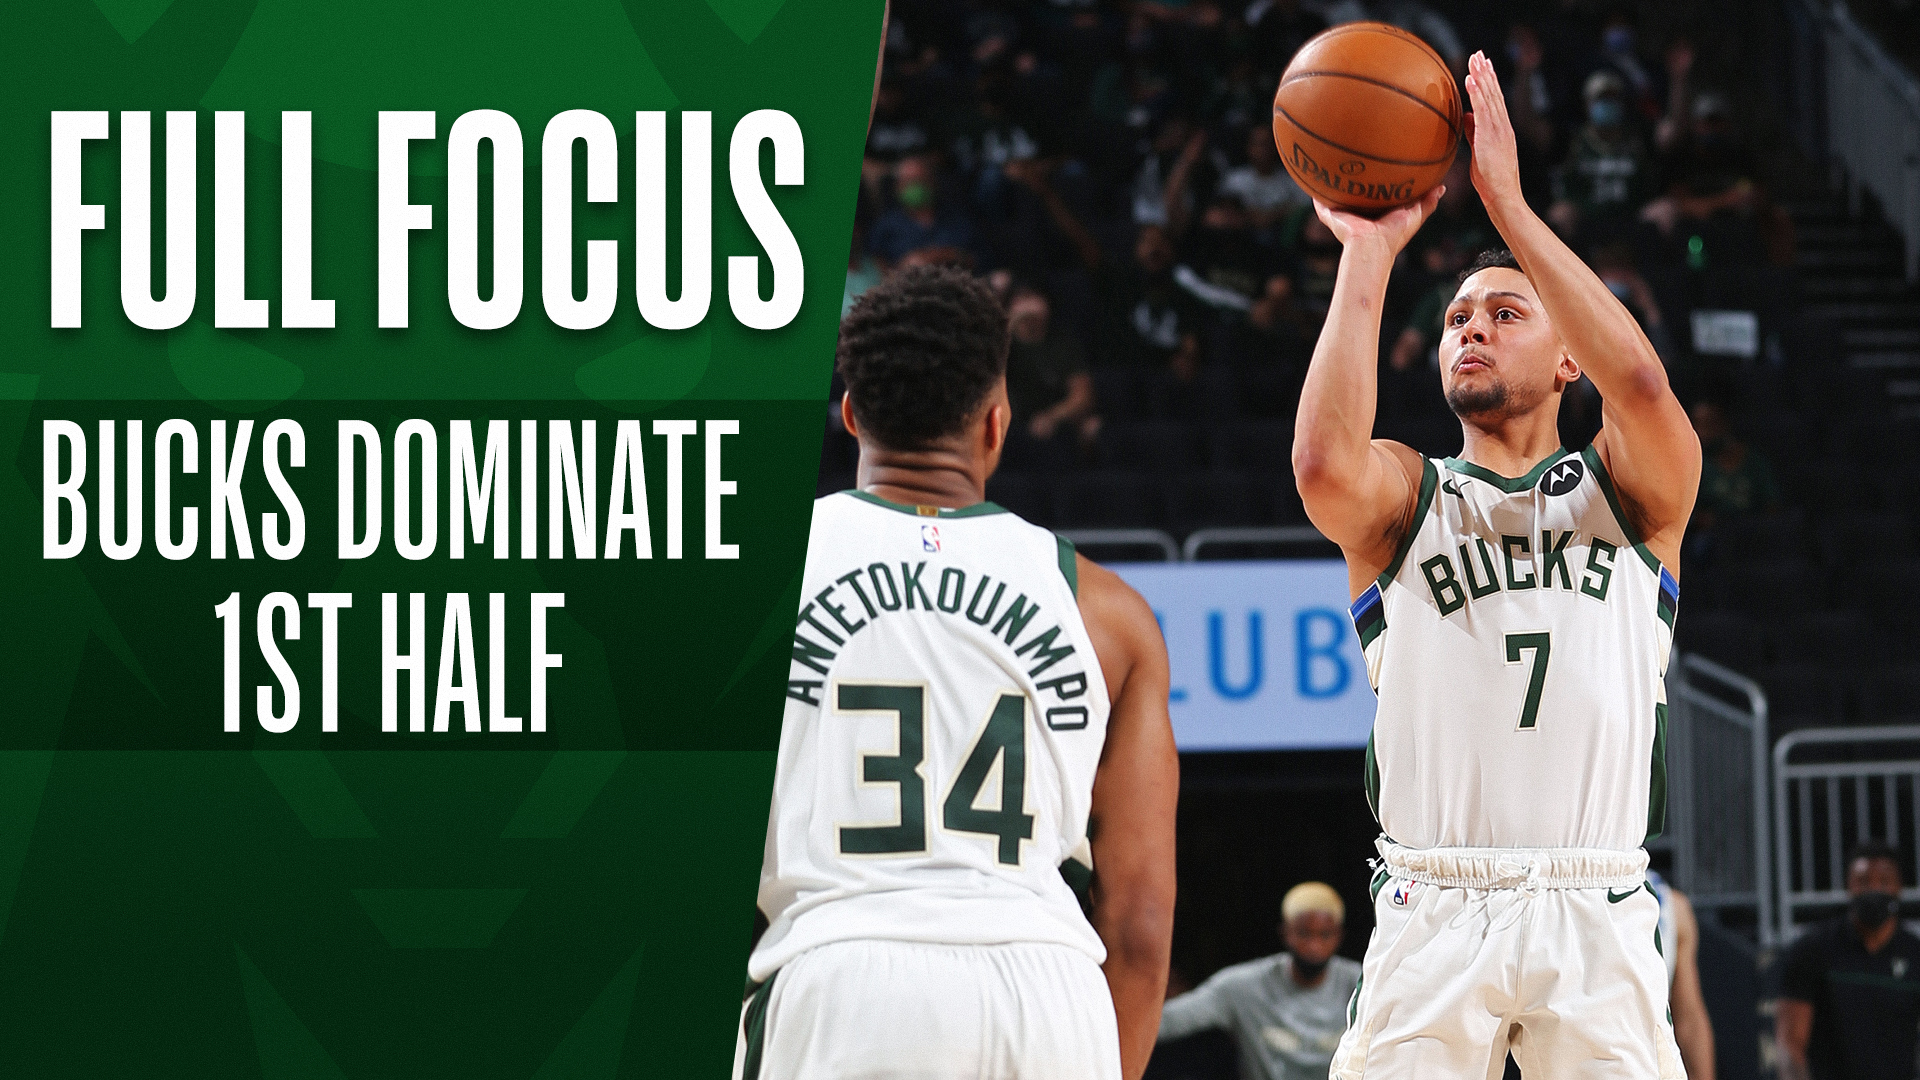 Full Focus: Bucks light it up in the first half